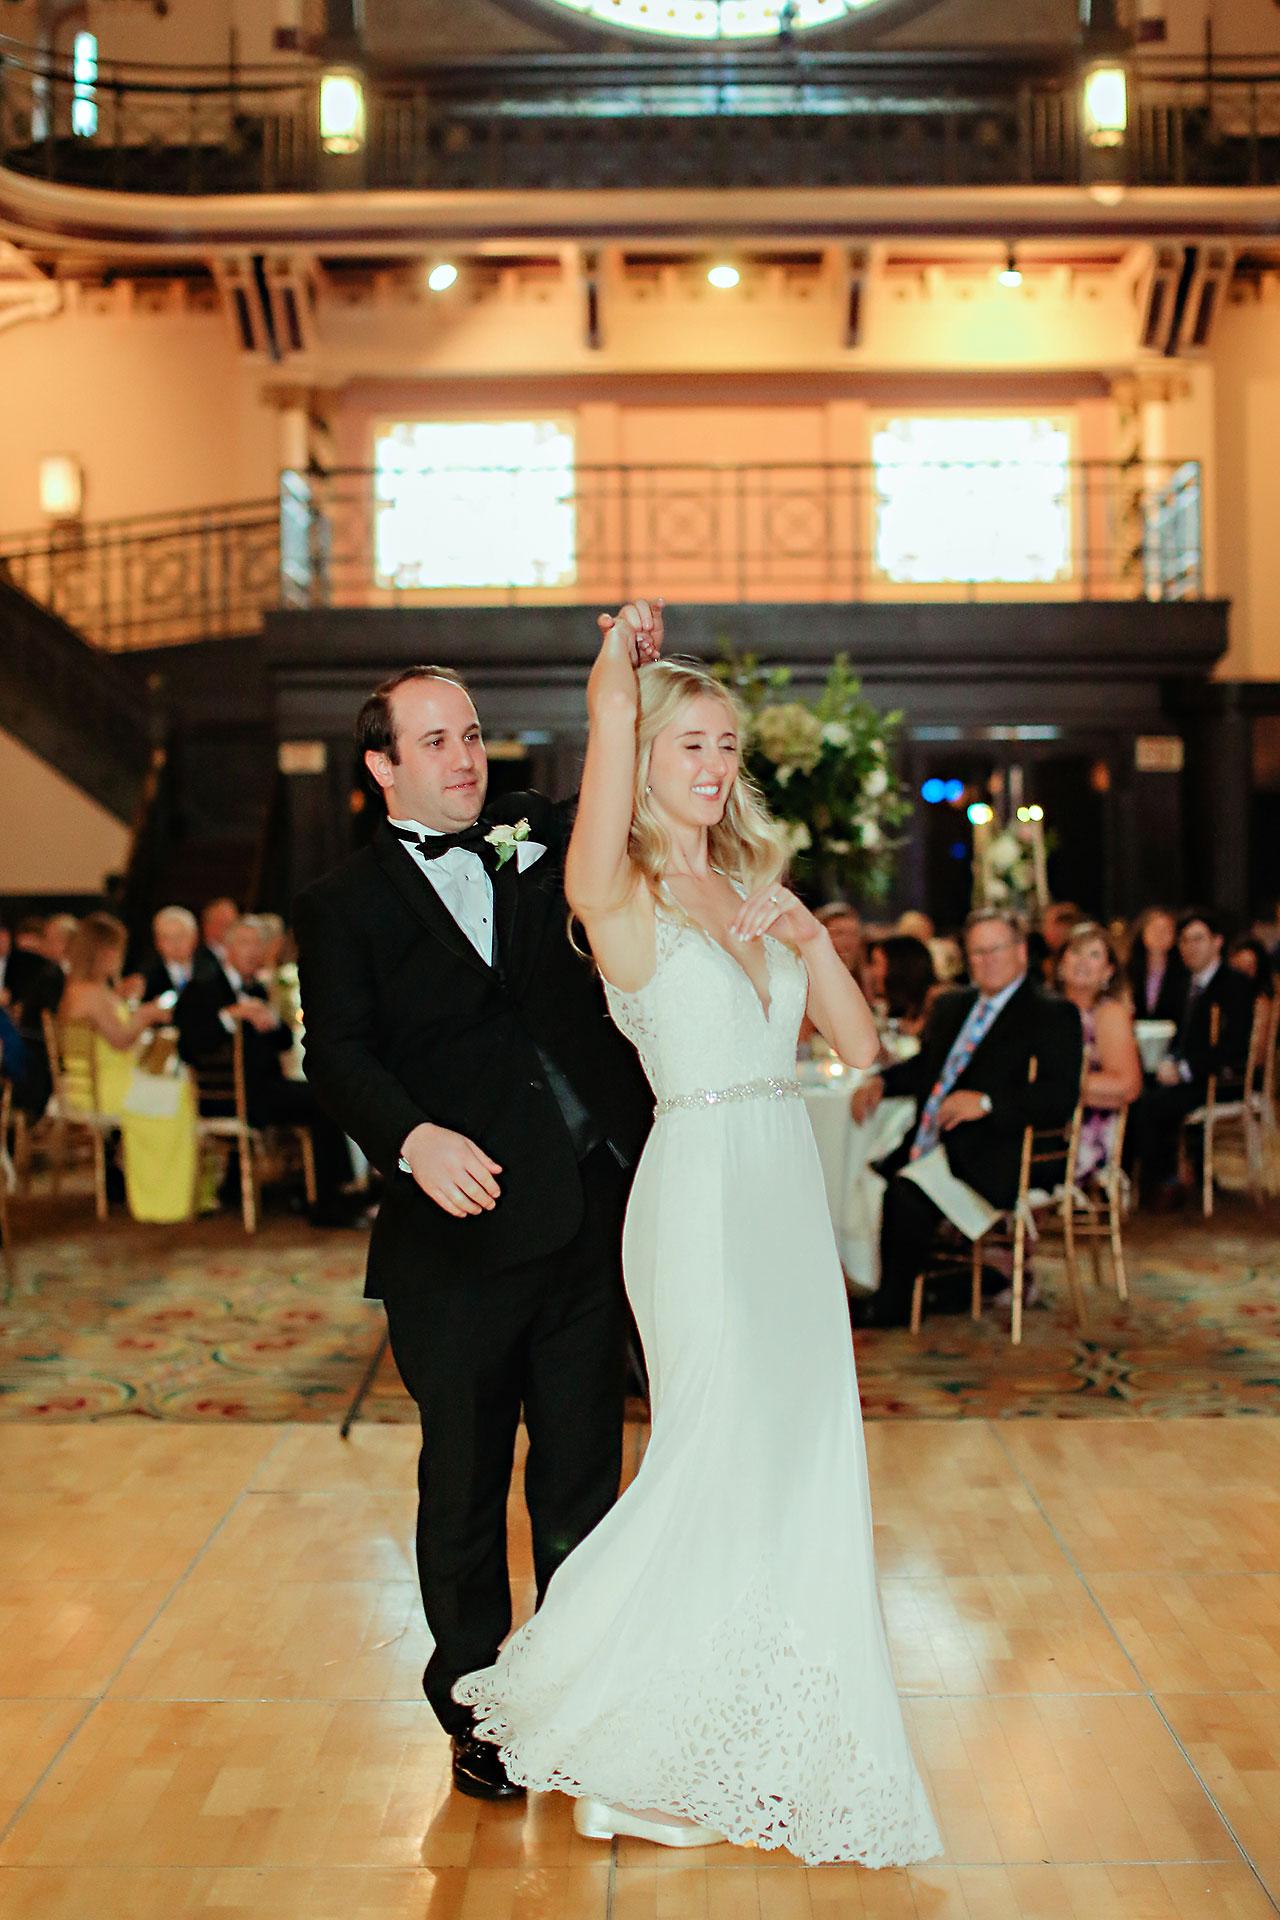 Allison Jeff Union Station Crowne Plaza Indianapolis wedding 296